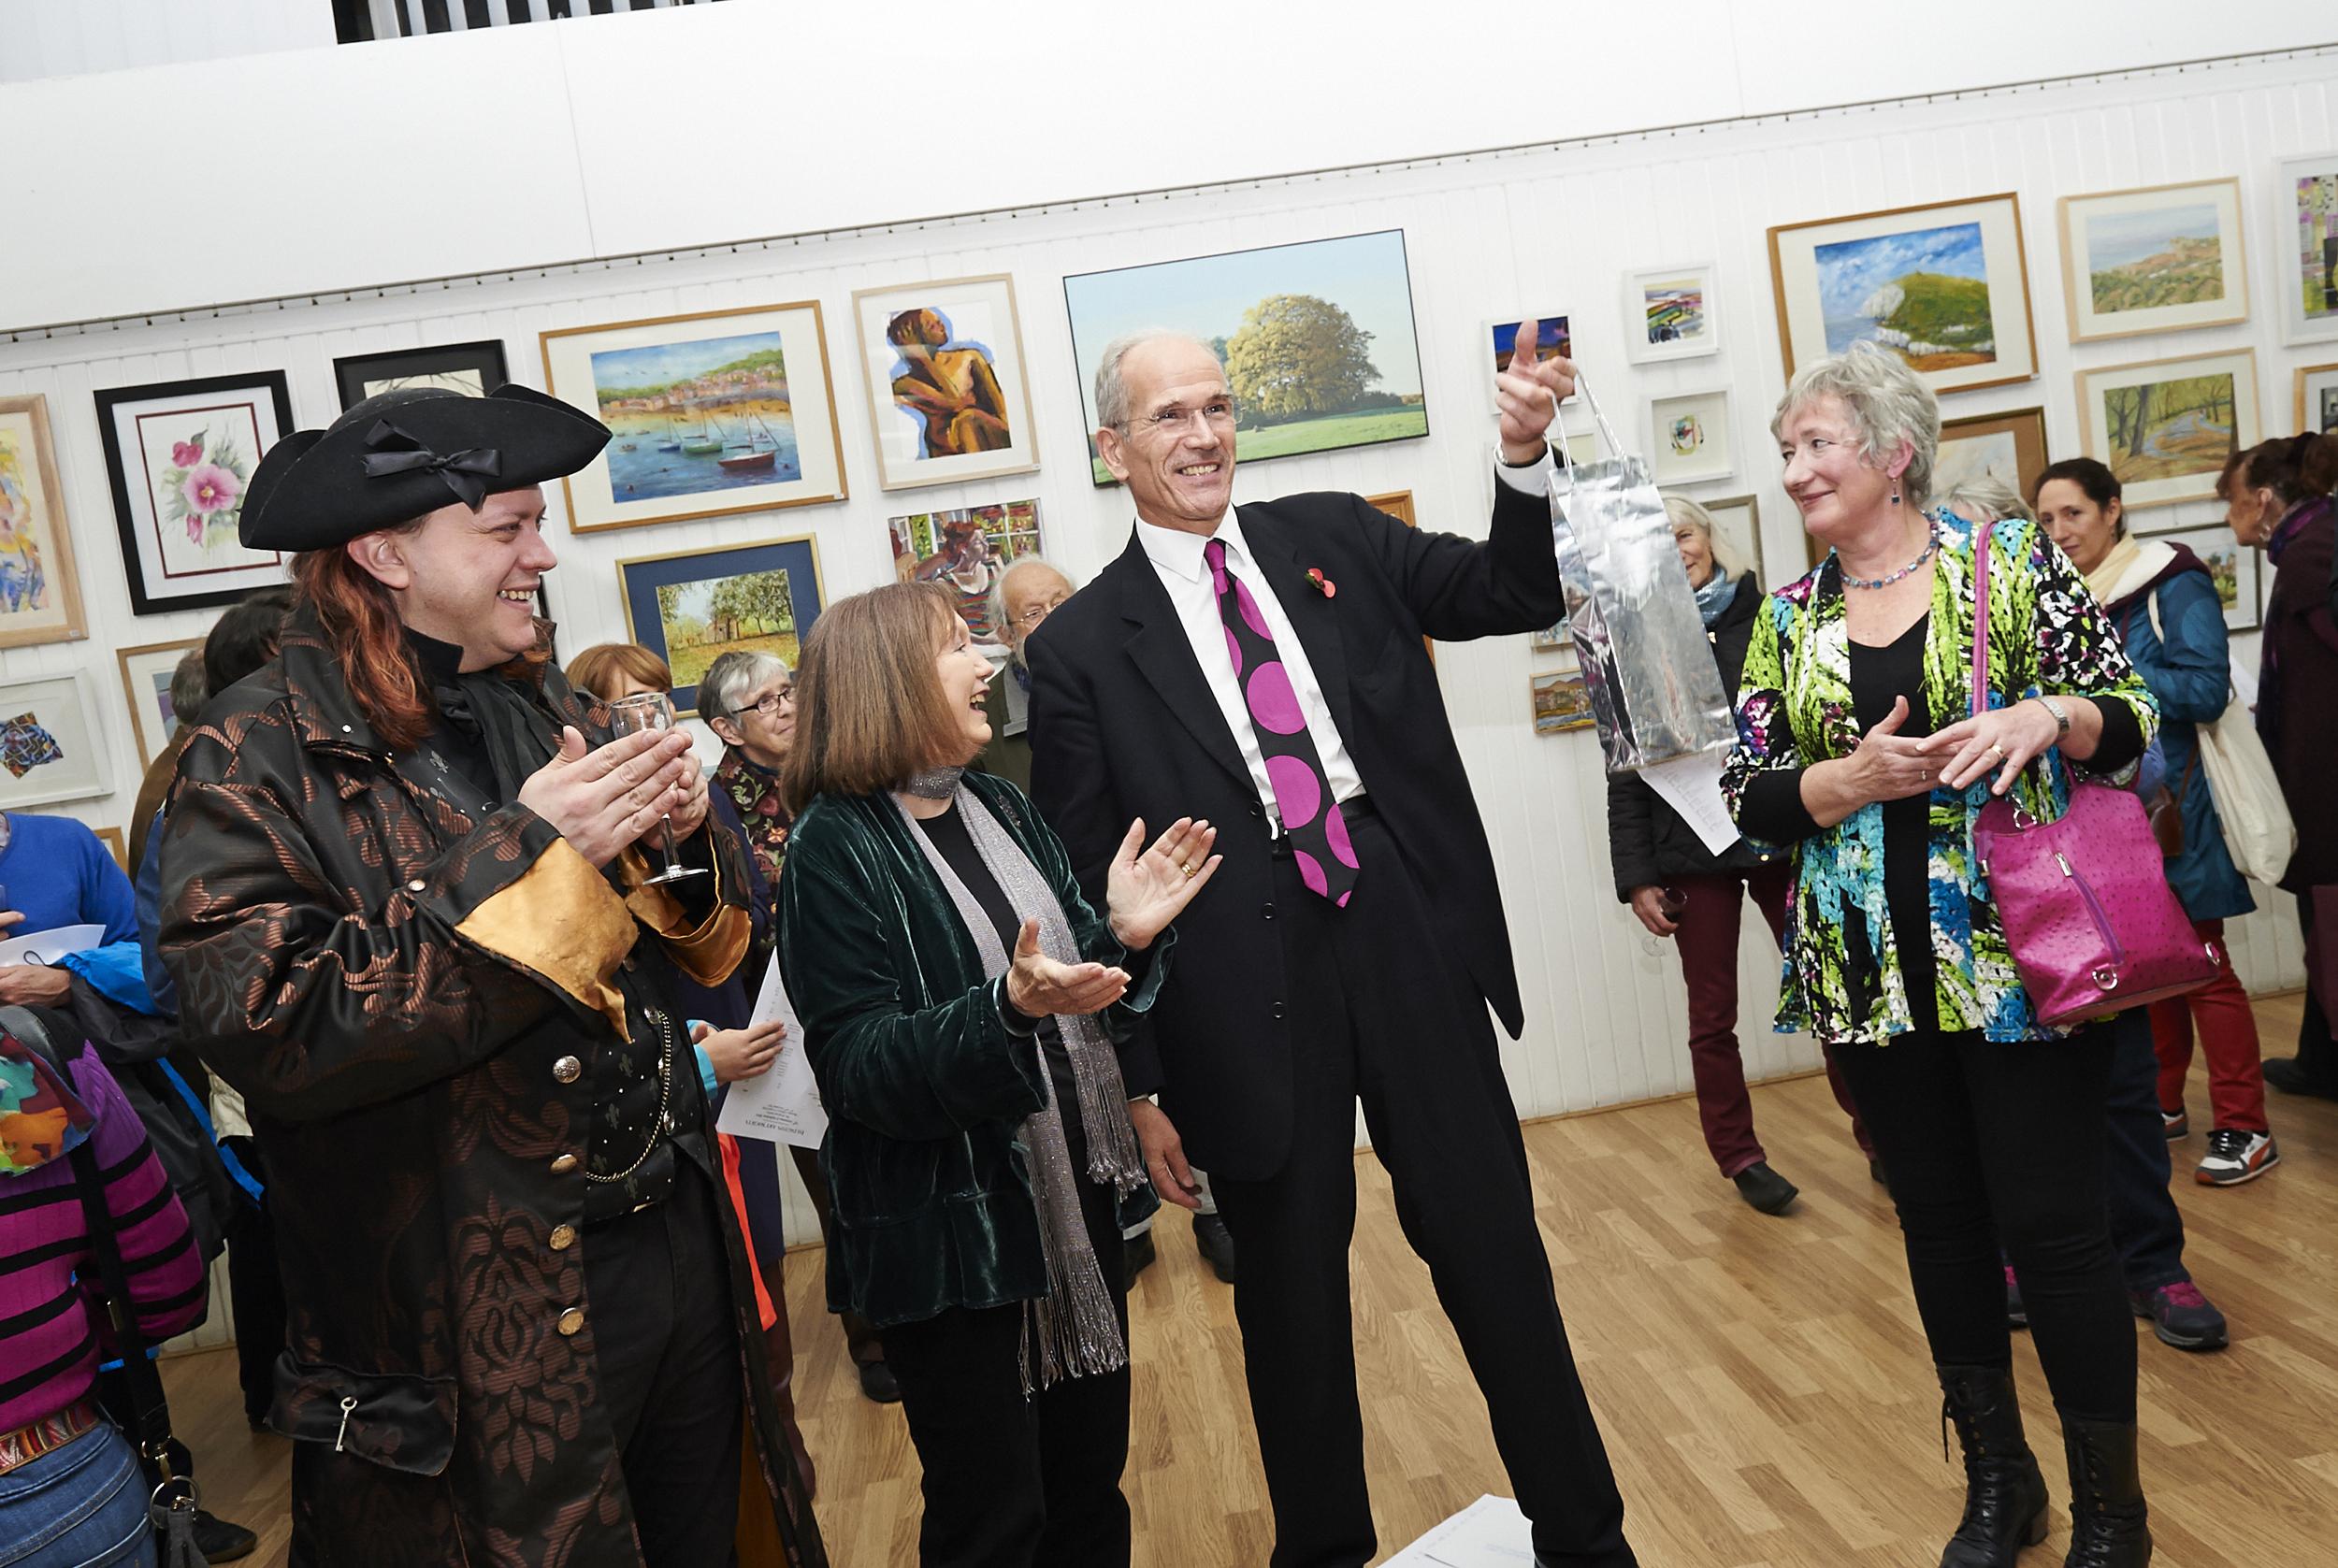 Member Robin Stevenson, chair Virginia Jackson, Sandy Nairne, director of the National Portrait Gallery and secretary Jo Pethybridge